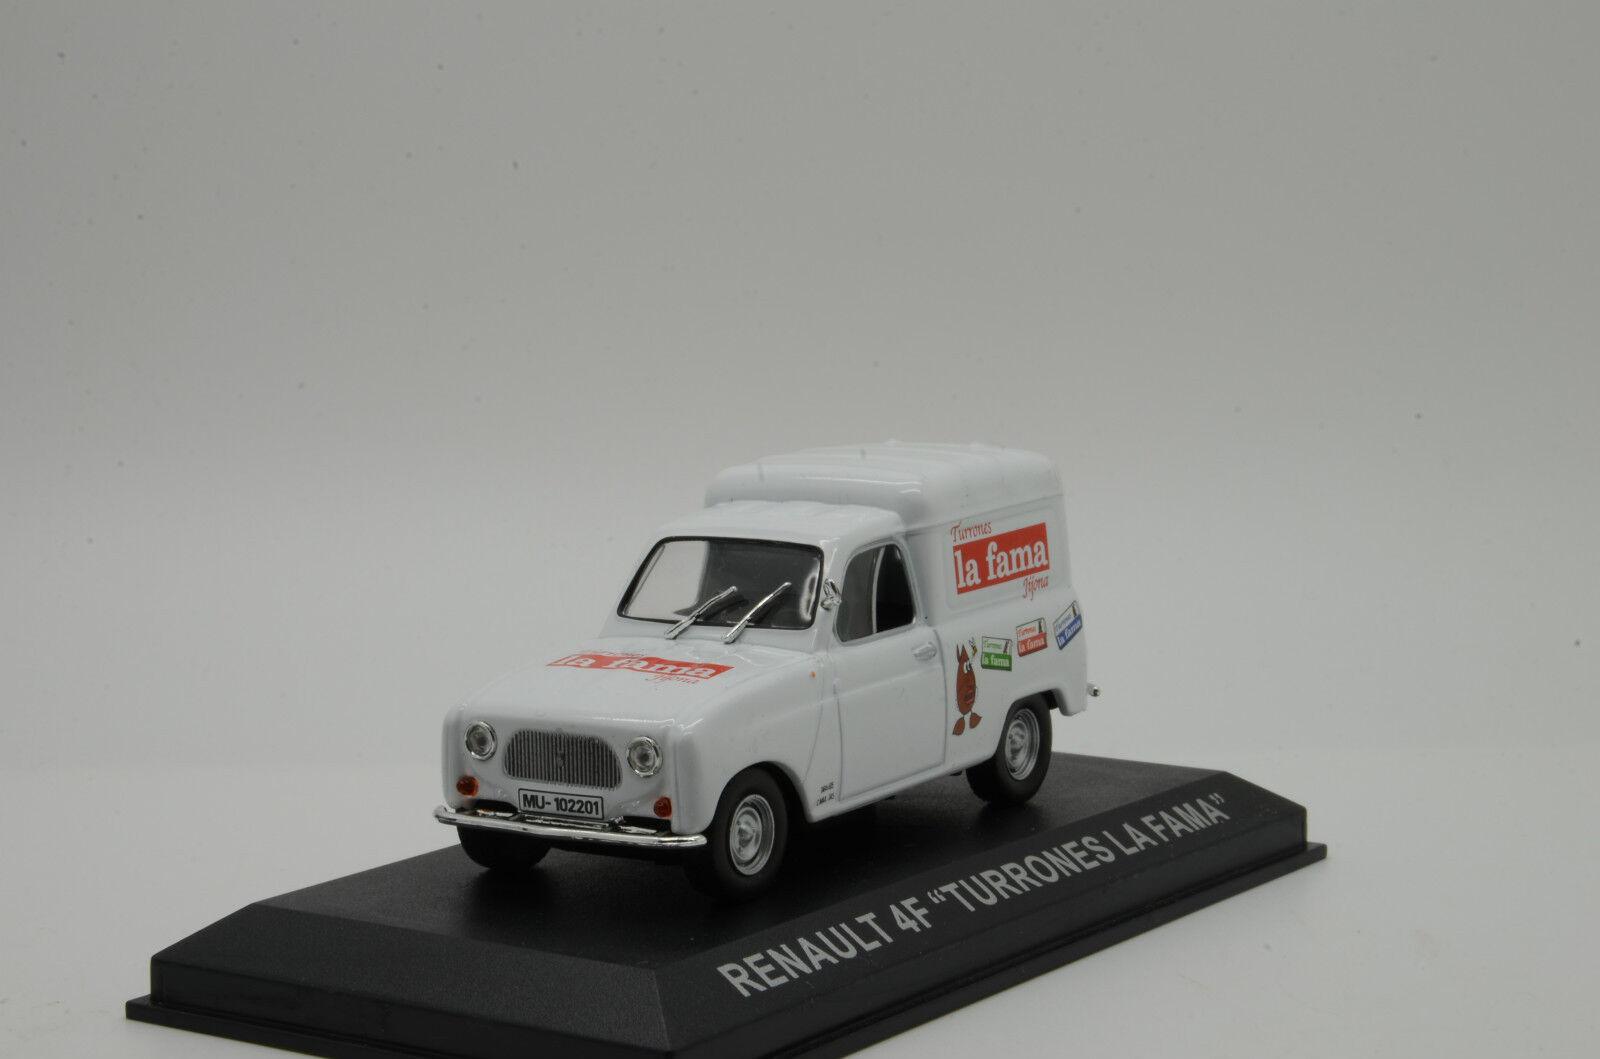 RARE    Renault 4F   Turrones La Fama   Altaya 1 43